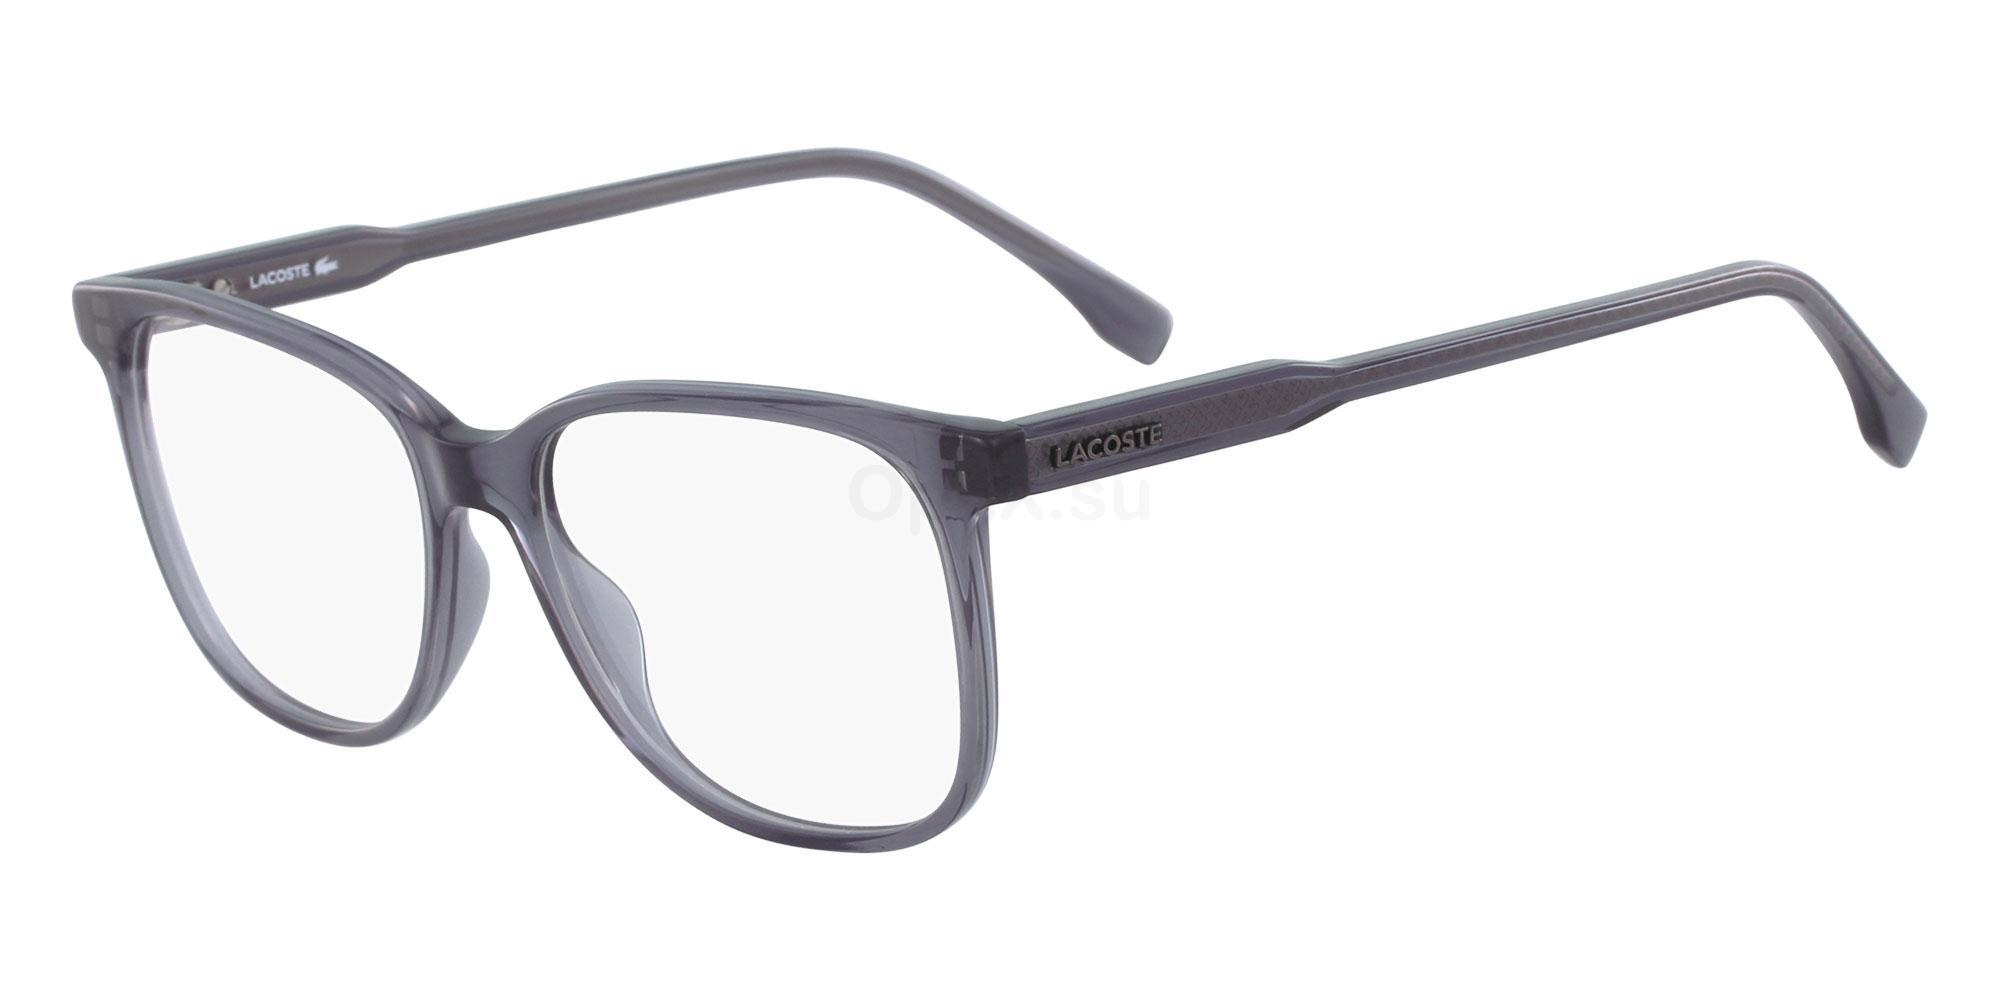 035 L2839 Glasses, Lacoste